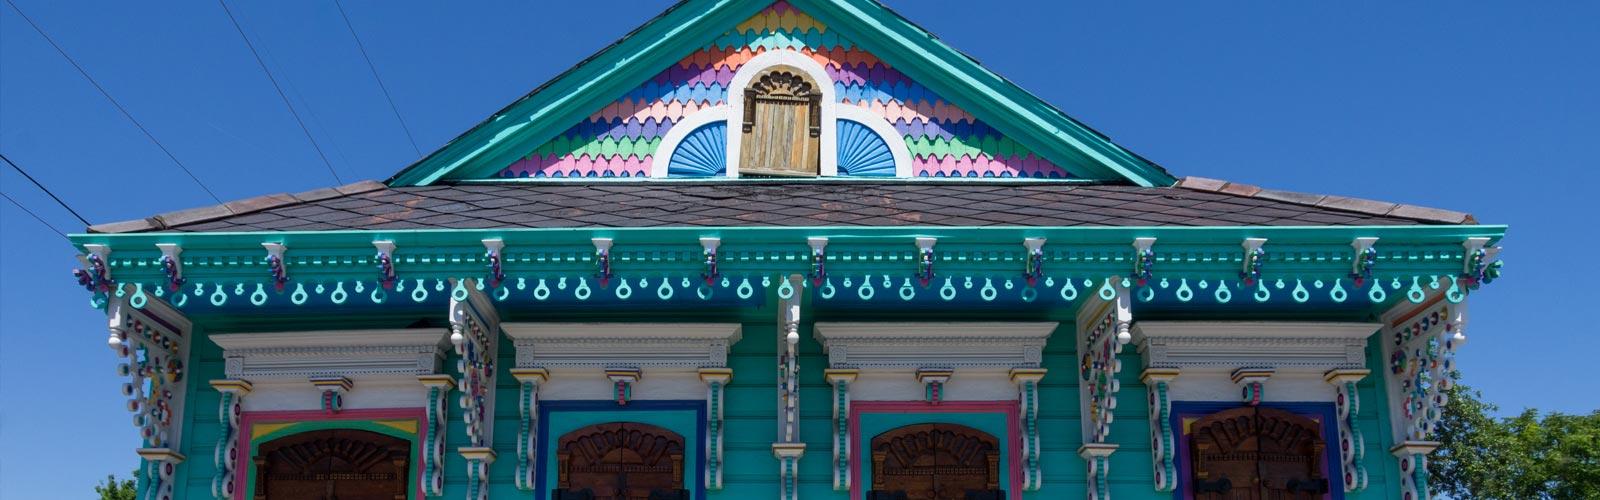 St. Claude New Orleans